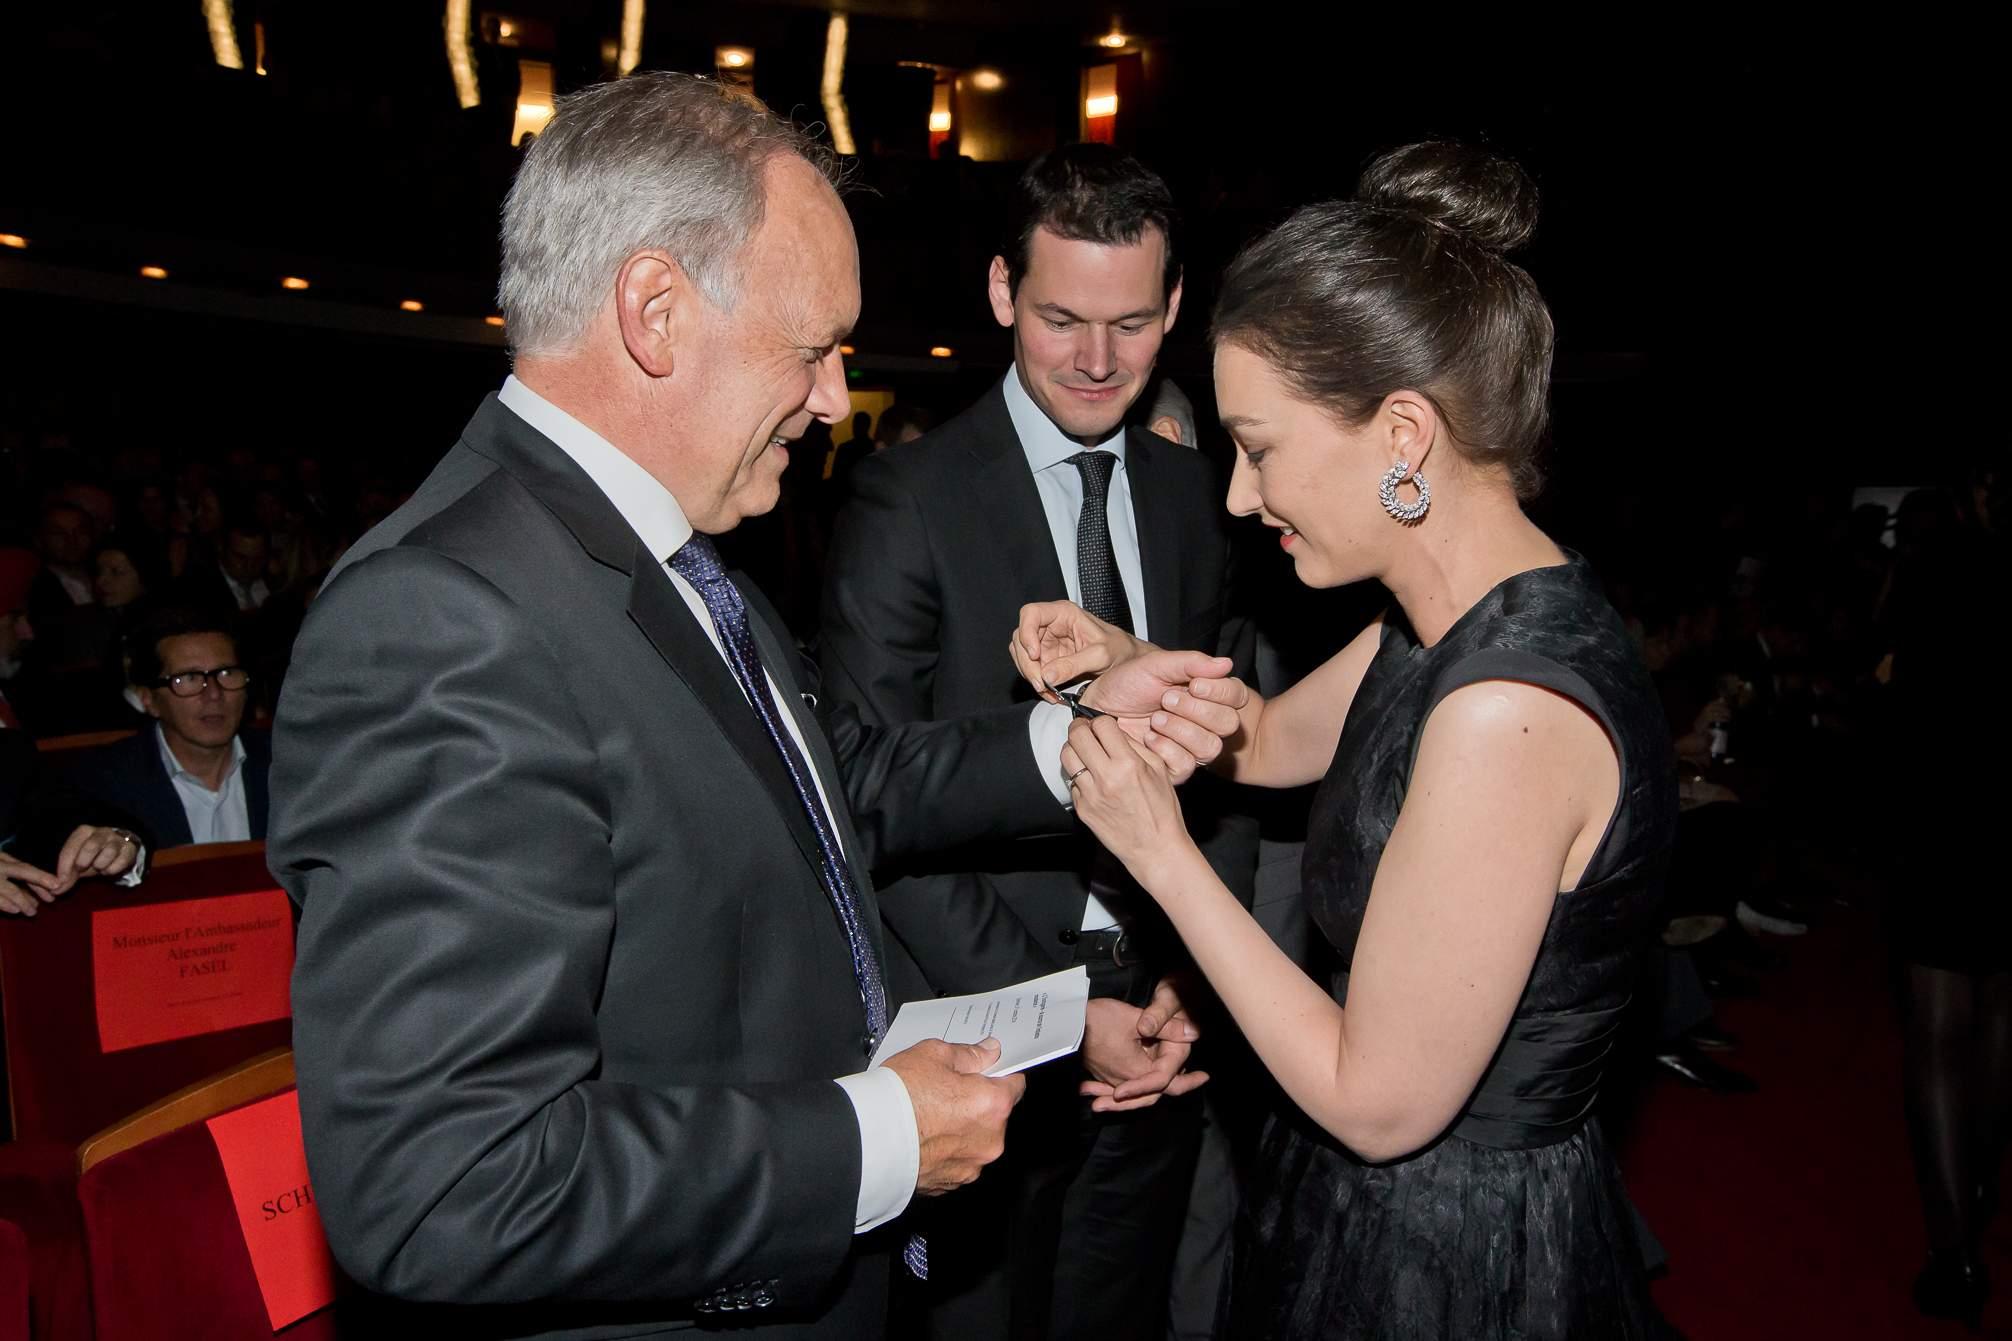 Johann Schneider-Ammann (Federal councillor), Pierre Maudet (State councillor) and Carine Maillard (Director of the GPHG Foundation)